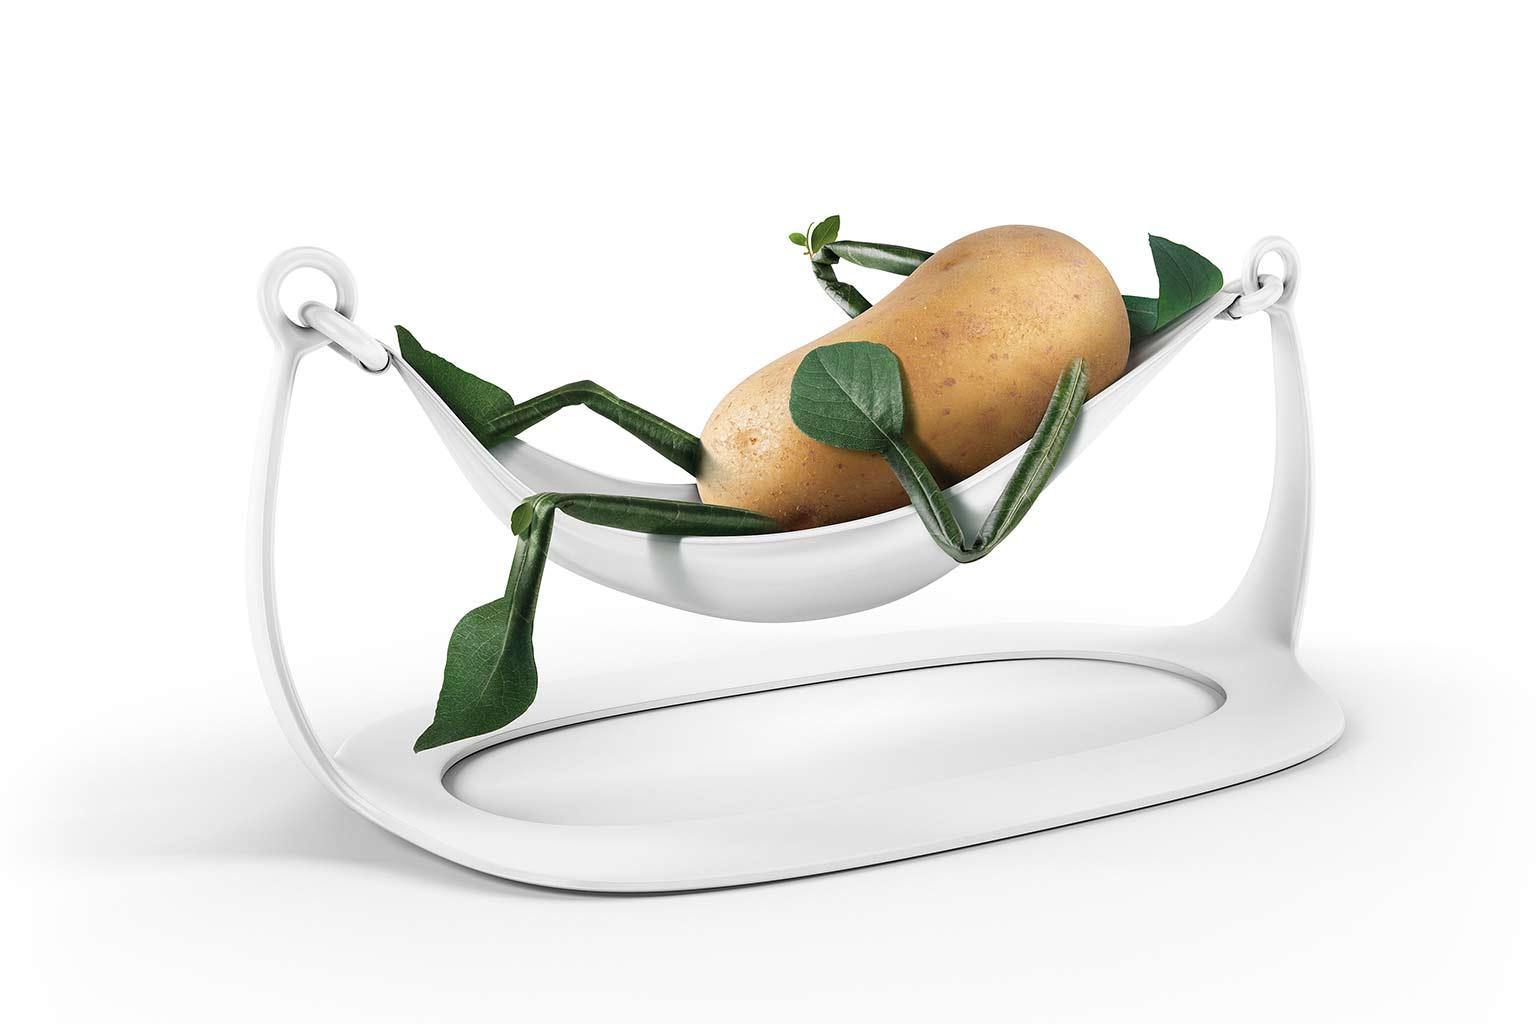 HKF_Luna_Motiv_Kartoffel_Hängematte